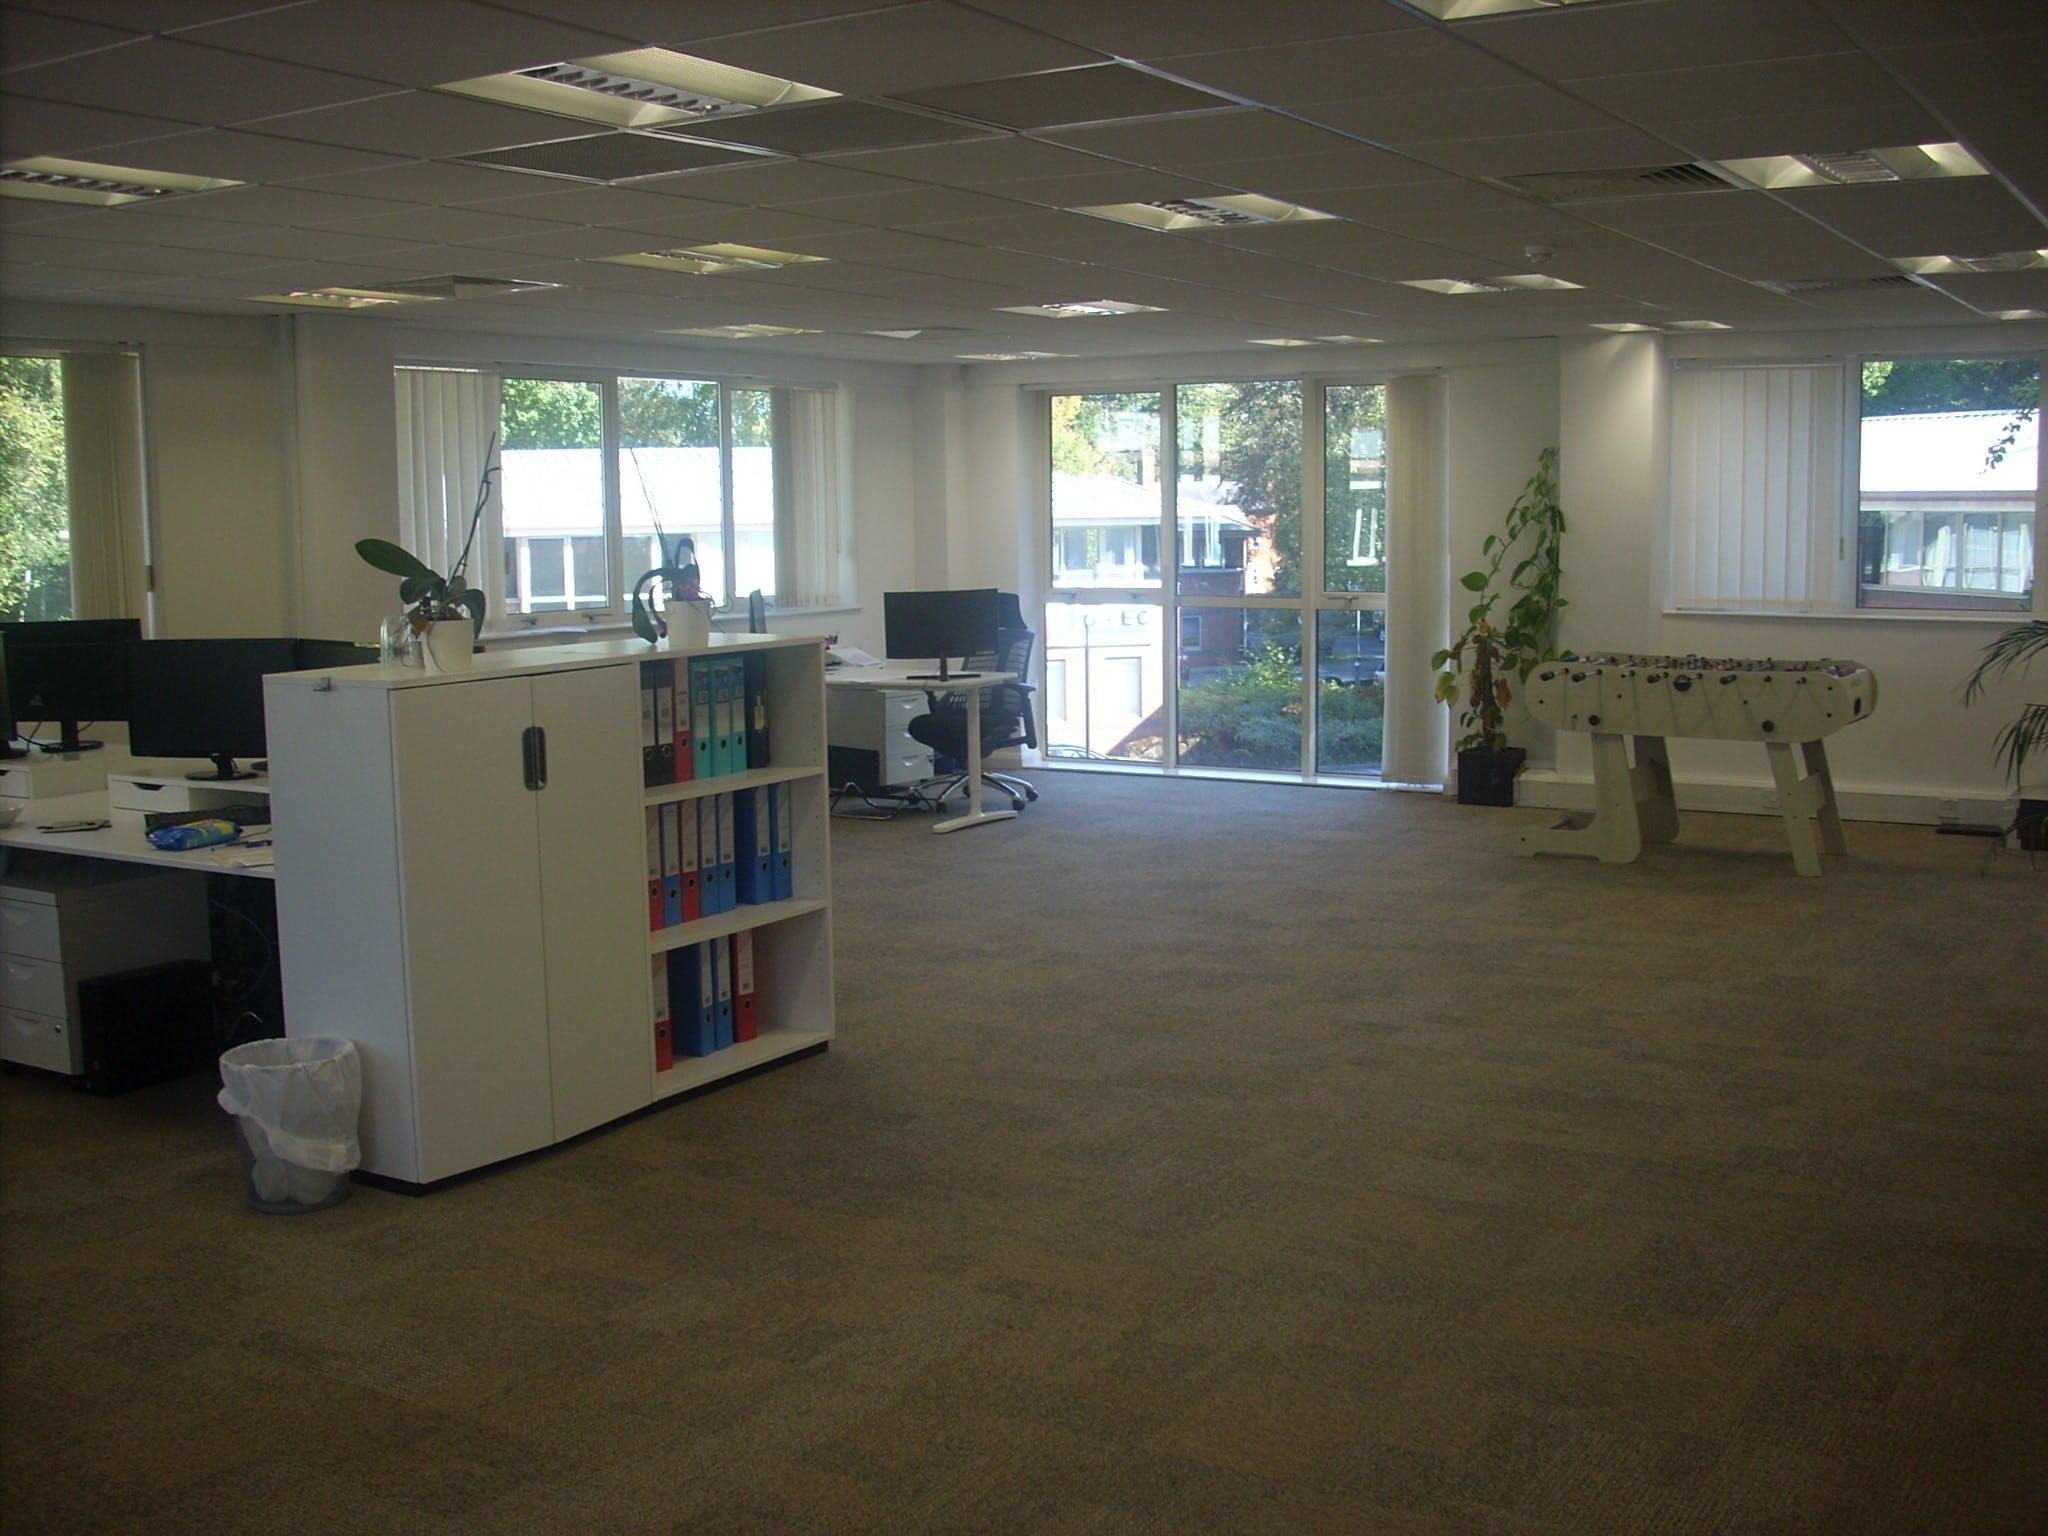 First Floor, 31 Wellington Business Park, Crowthorne, Offices To Let - afe80e5195faa041d10a52a297632b7c511ded36.jpg